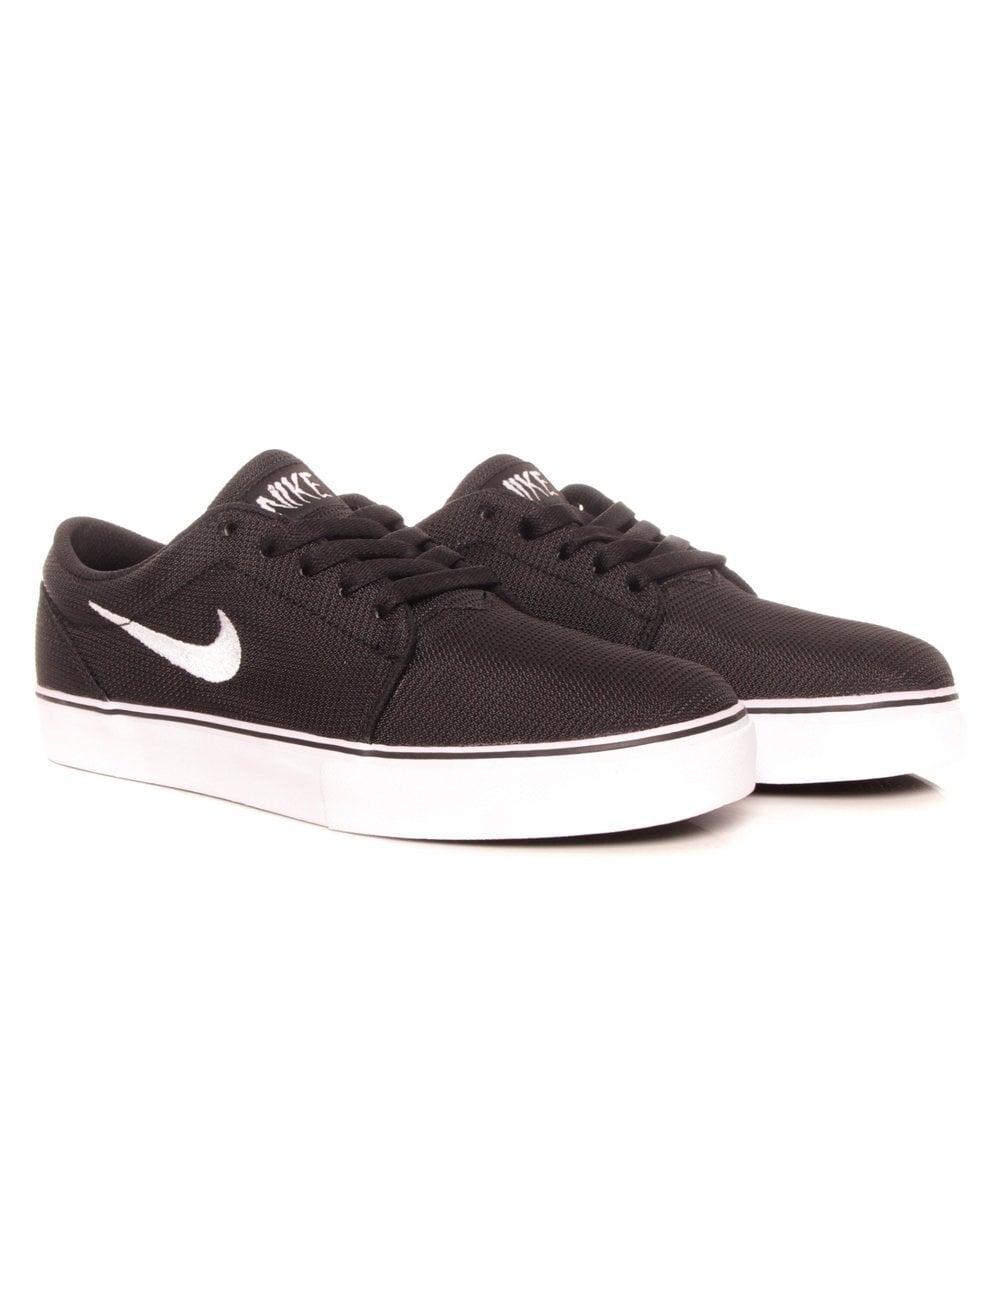 Nike Sb Satire Black White Footwear From Fat Buddha Store Uk